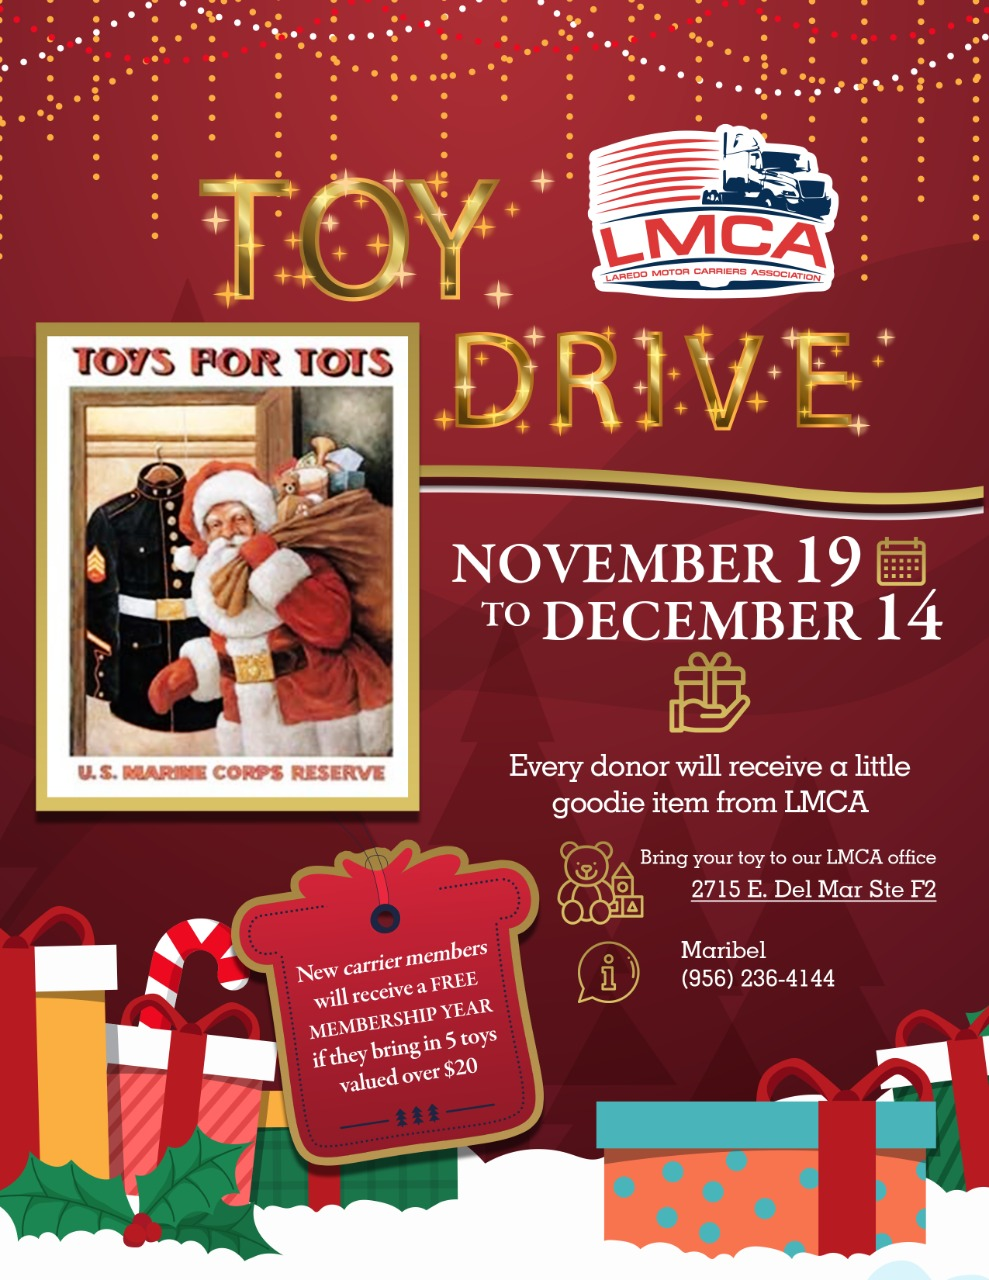 LMCA Toy Drive Invitation